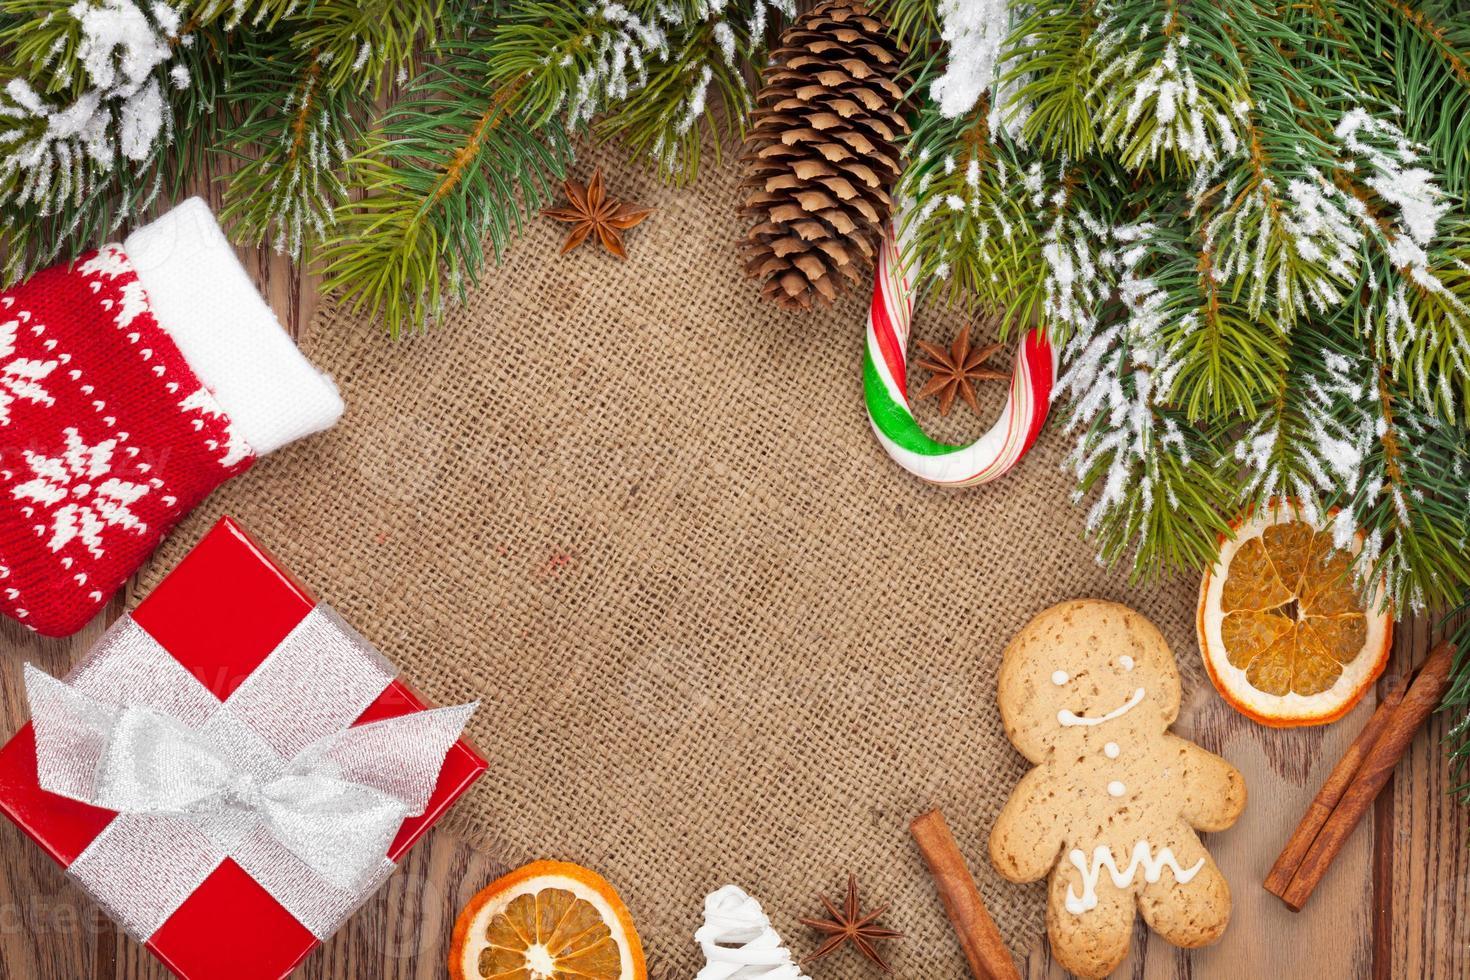 Christmas food, decor and gift box with snow fir tree photo